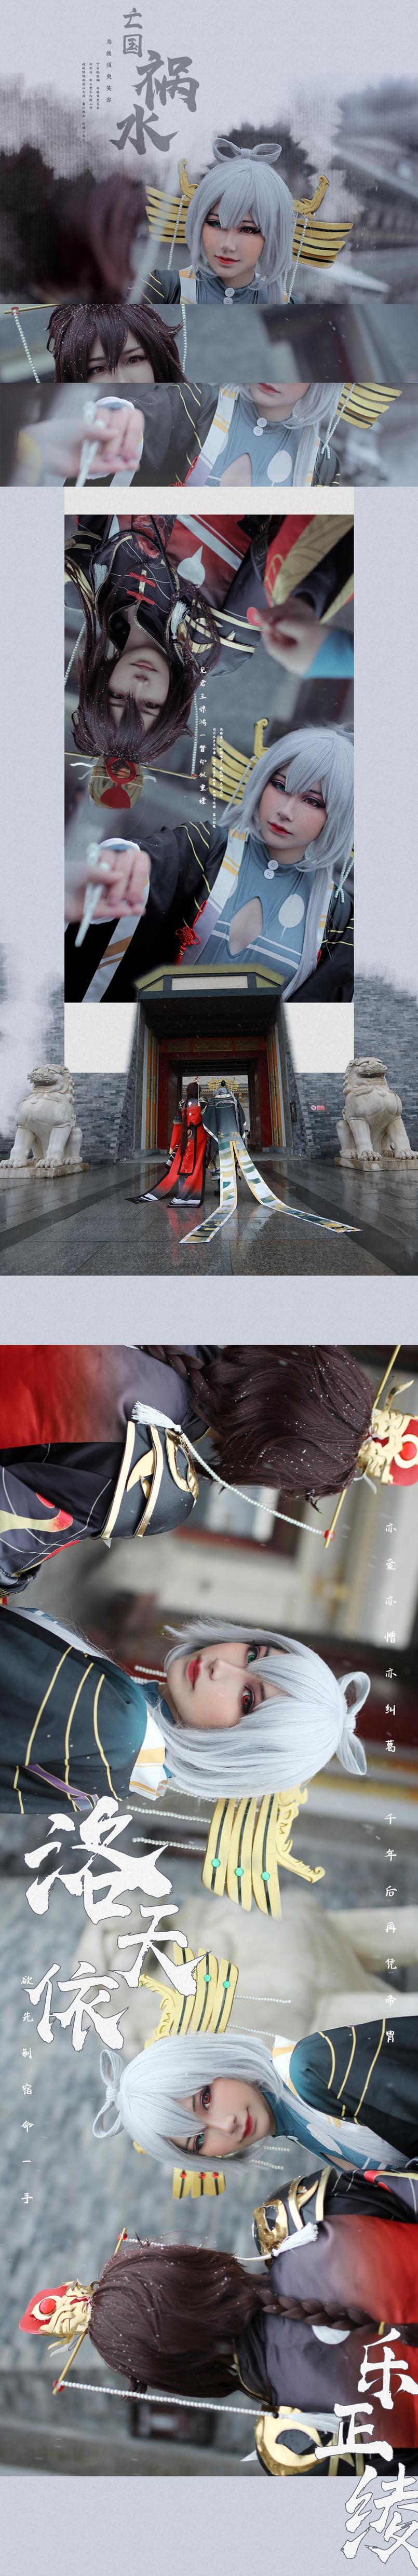 《VOCALOID》正片cosplay【CN:时雨-Jiu】-第3张